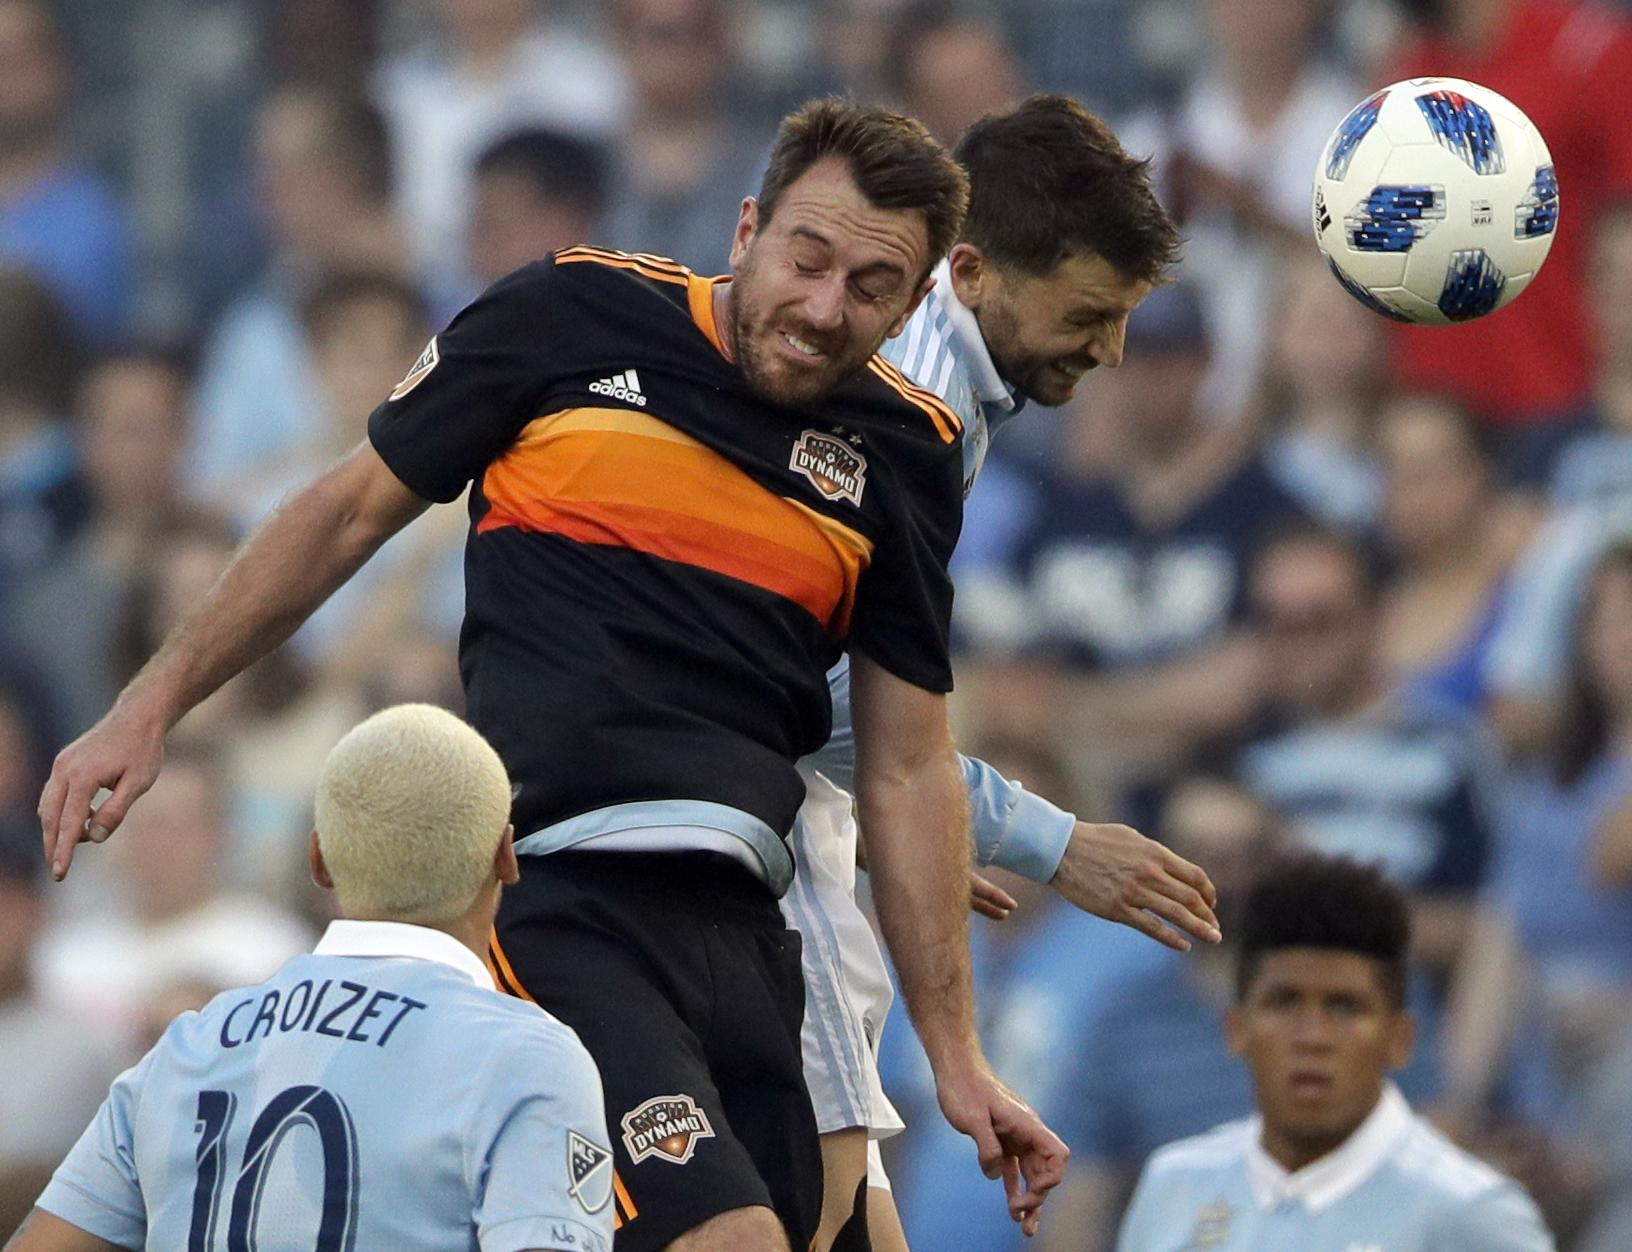 MLS Dynamo Sporting KC Soccer_1529811123067